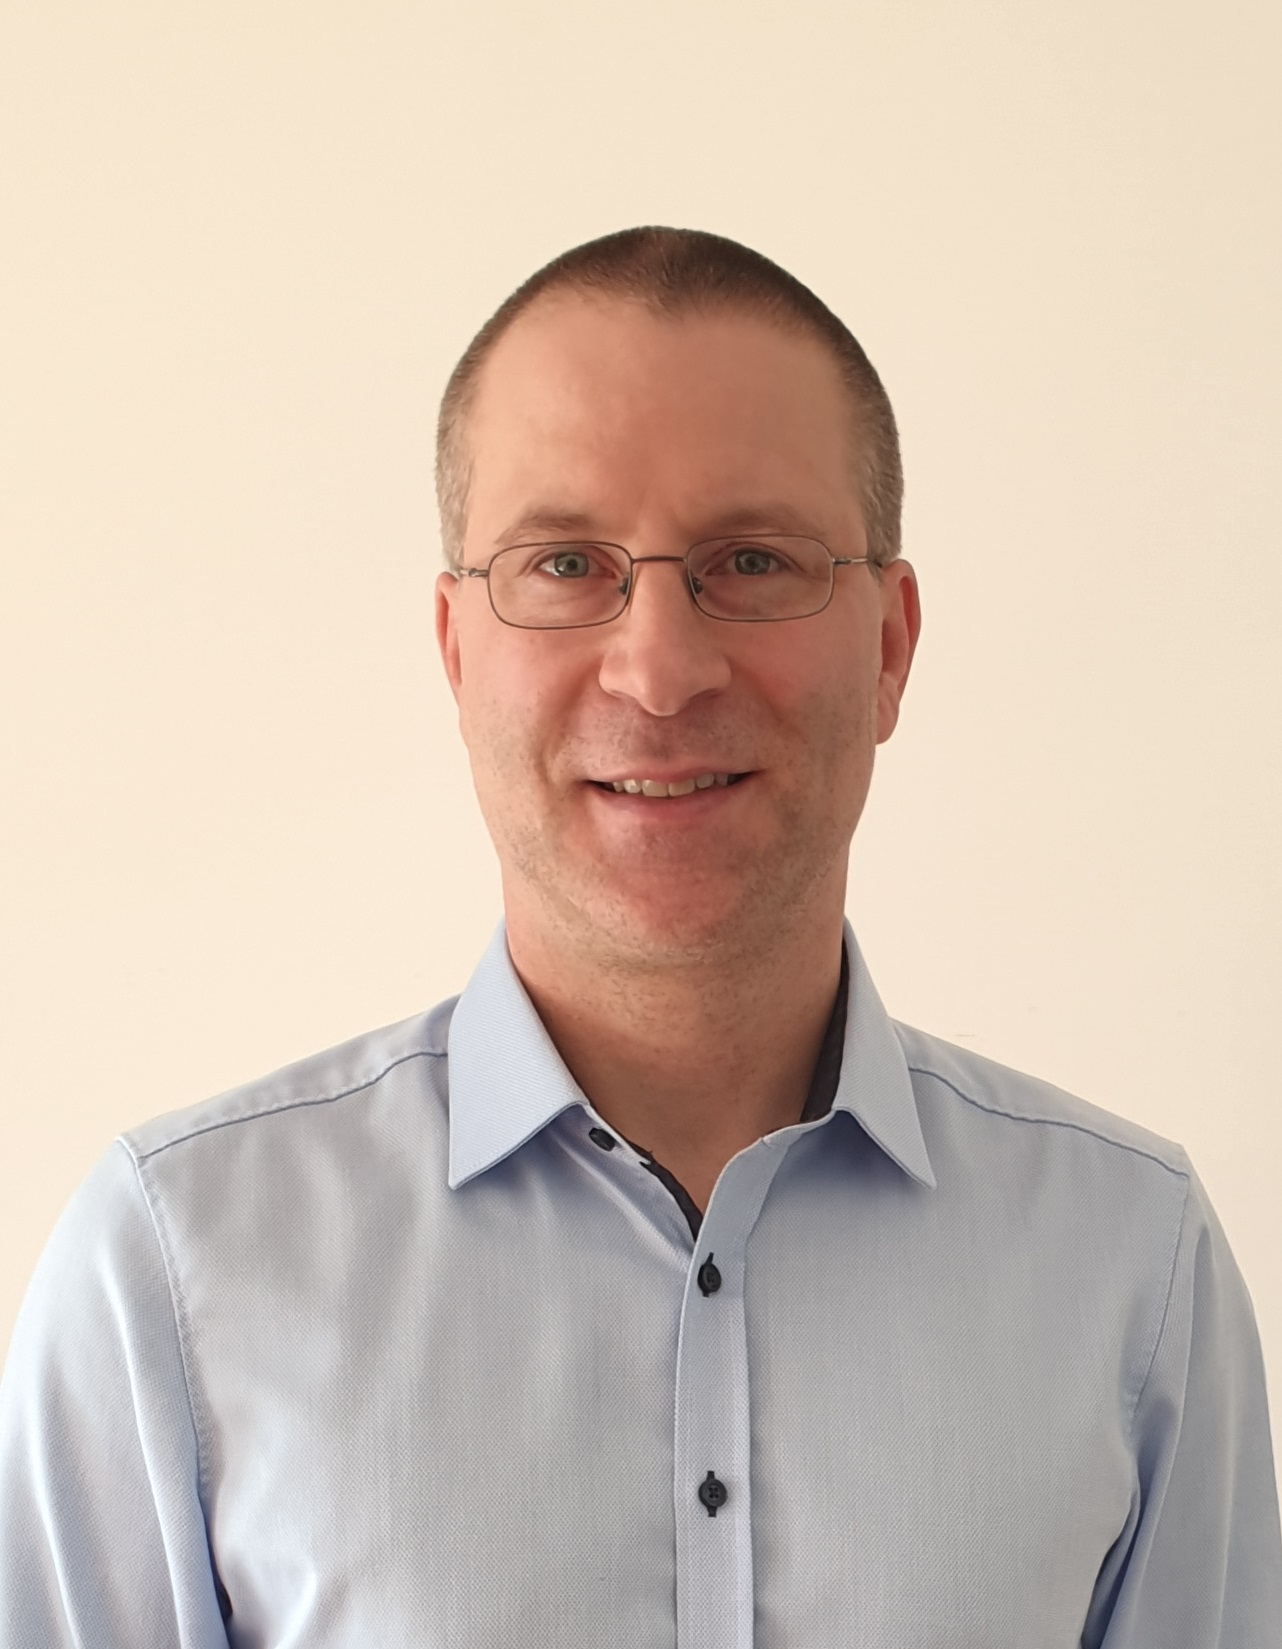 Johannes Christian Schmid Profilbild